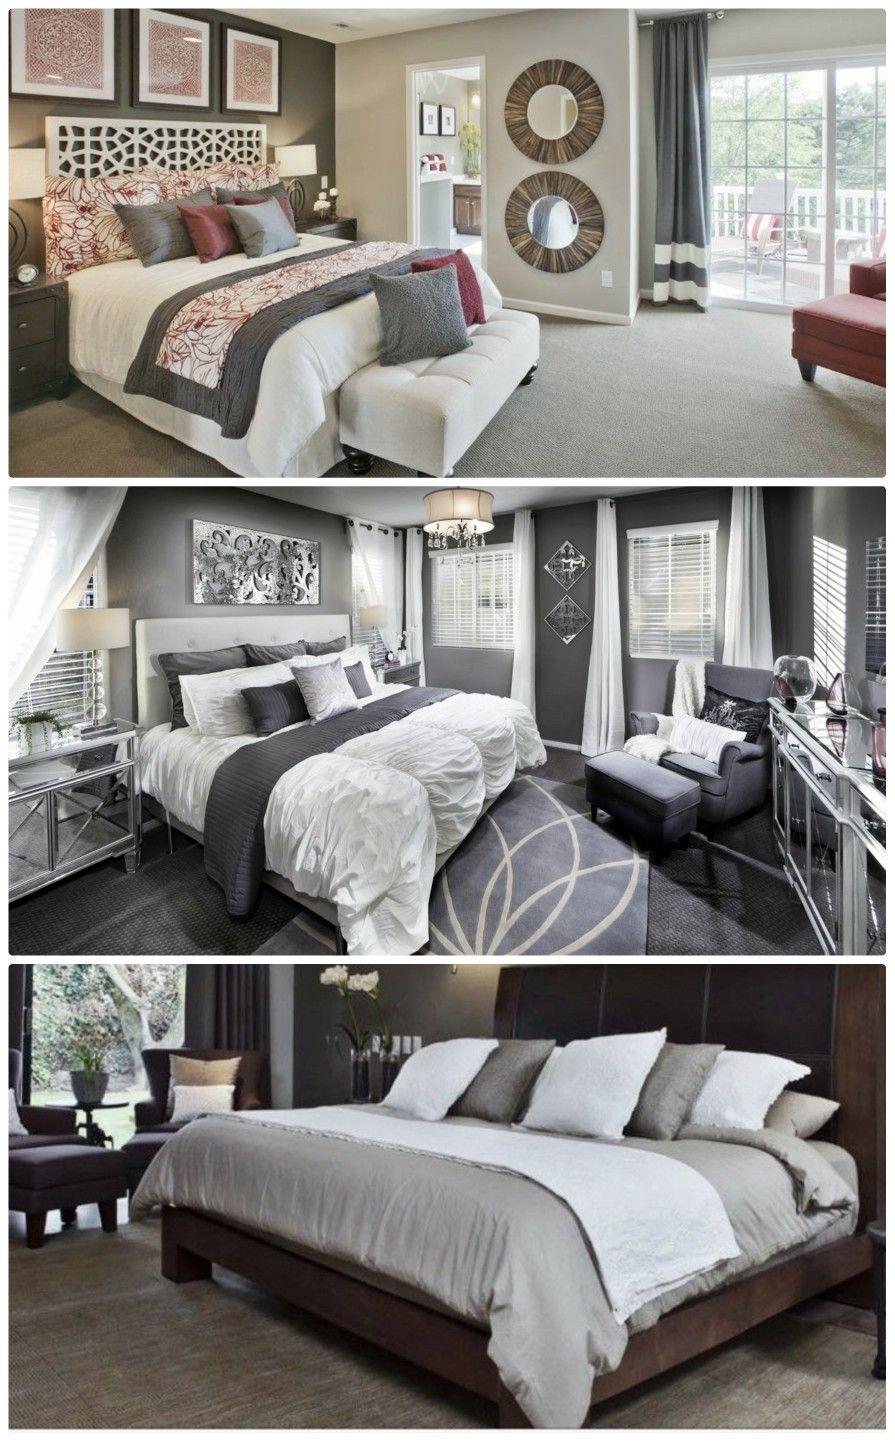 best bedroom decor design ideas for couples man u girls for